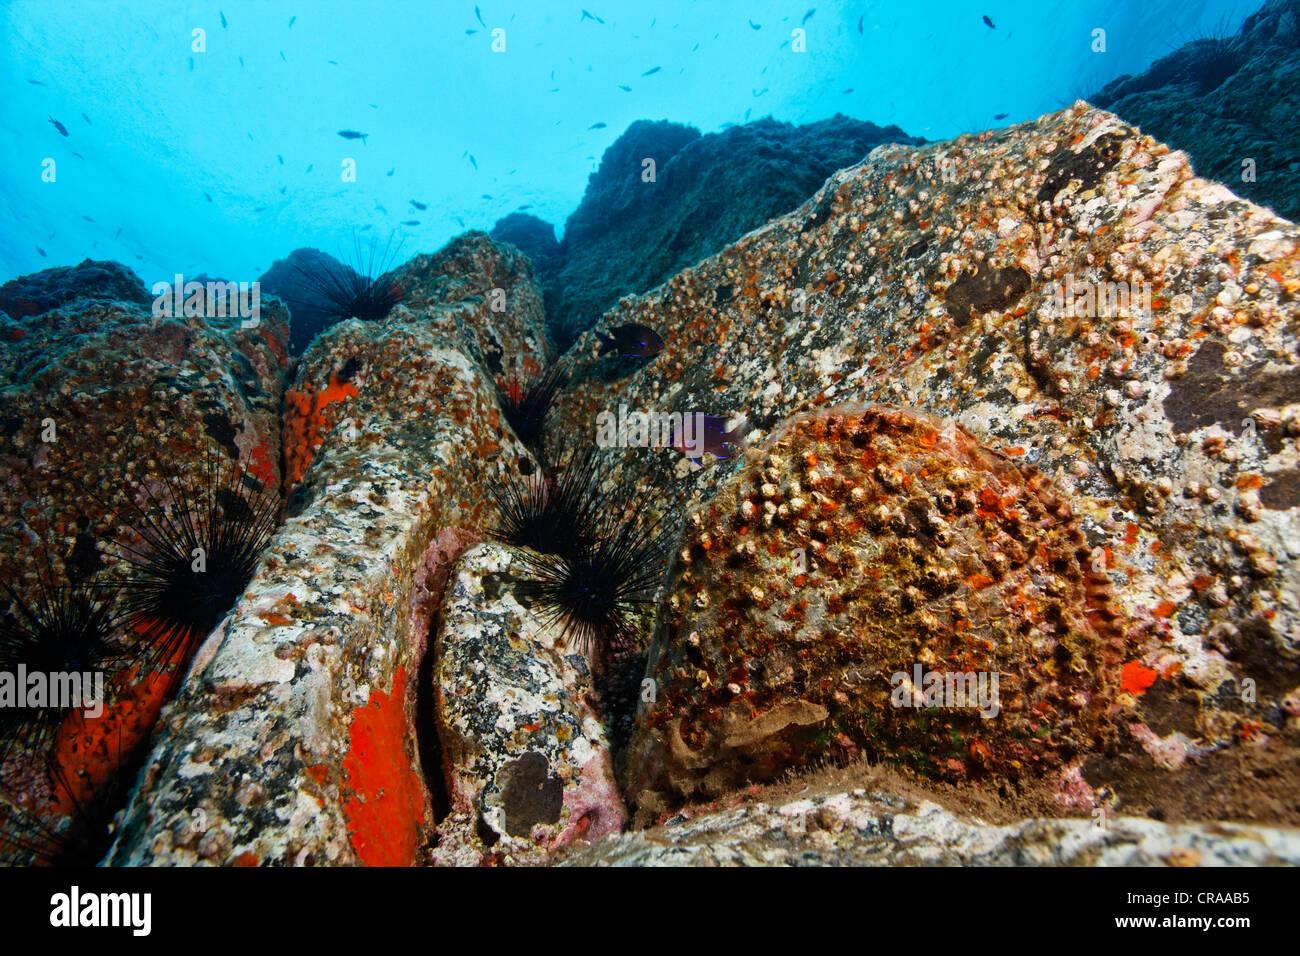 Penna ruvida Shell (Pinna rudis), Acorn Barnacles (Balanus trigonus), rocce, rocky bocchetta a lancia, Madeira, Immagini Stock